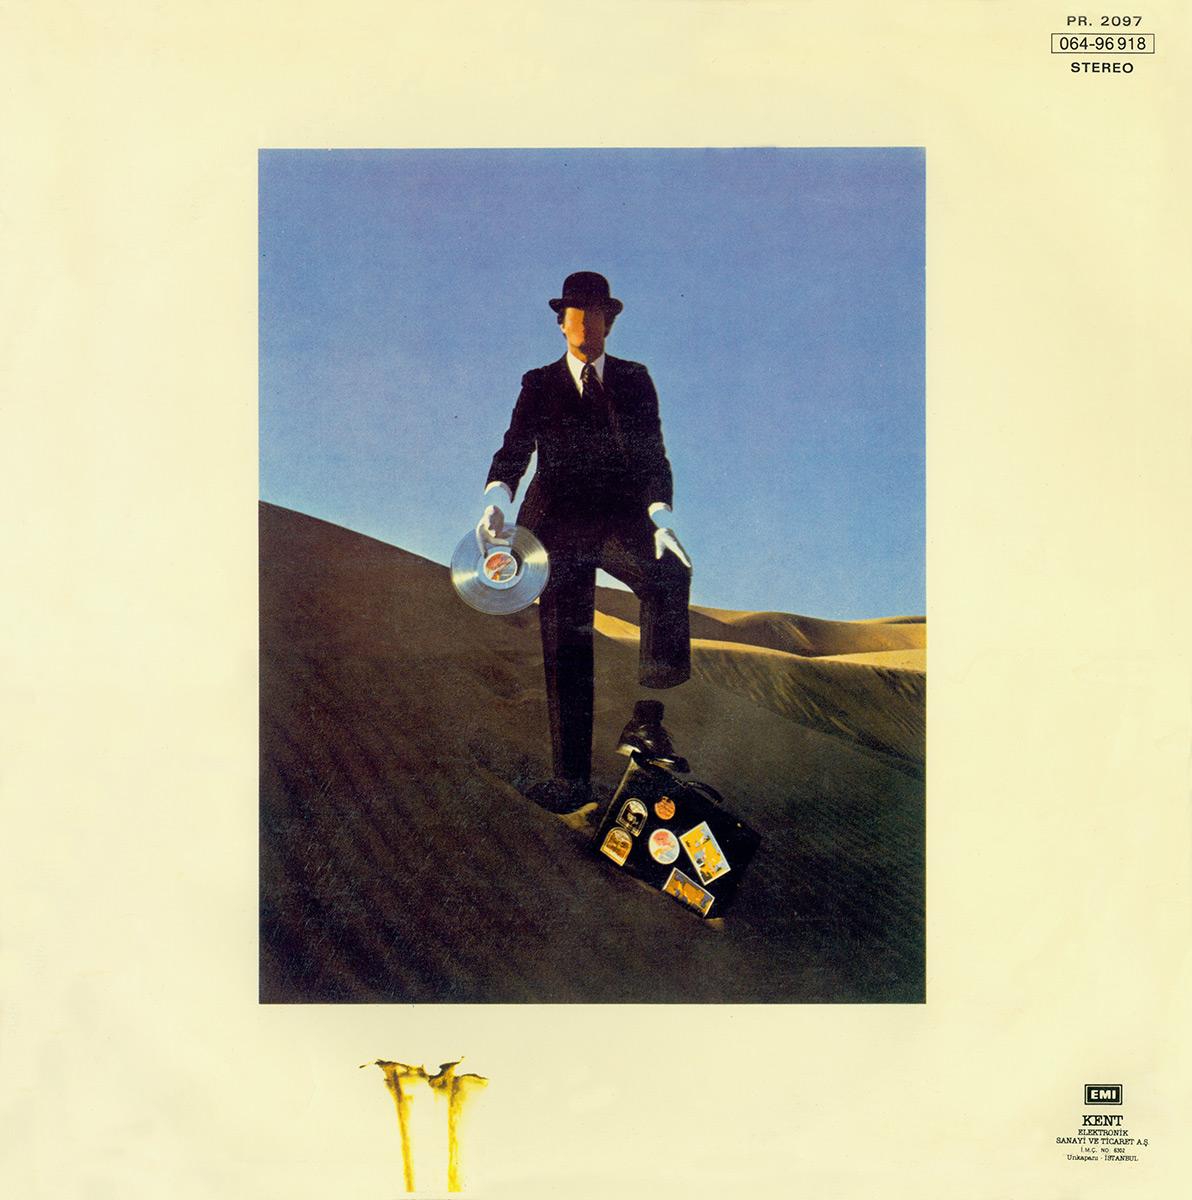 Amazoncom: Shine On You Crazy Diamond Live: Pink Floyd